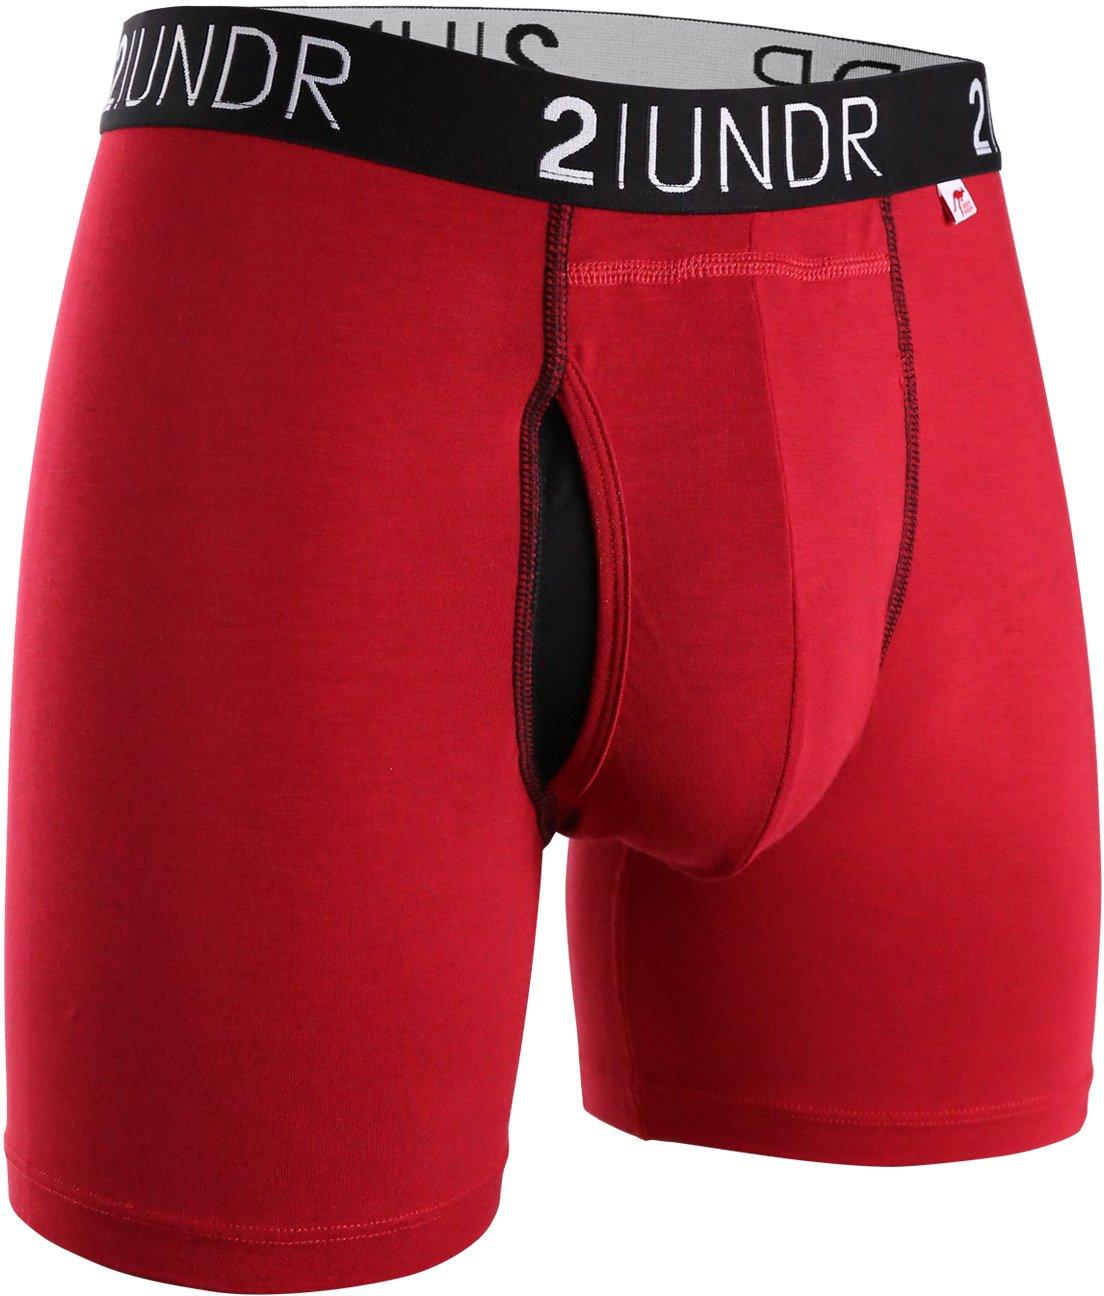 2UNDR Men's Swing Shift Folds of Honor Boxer Briefs 3-Pack